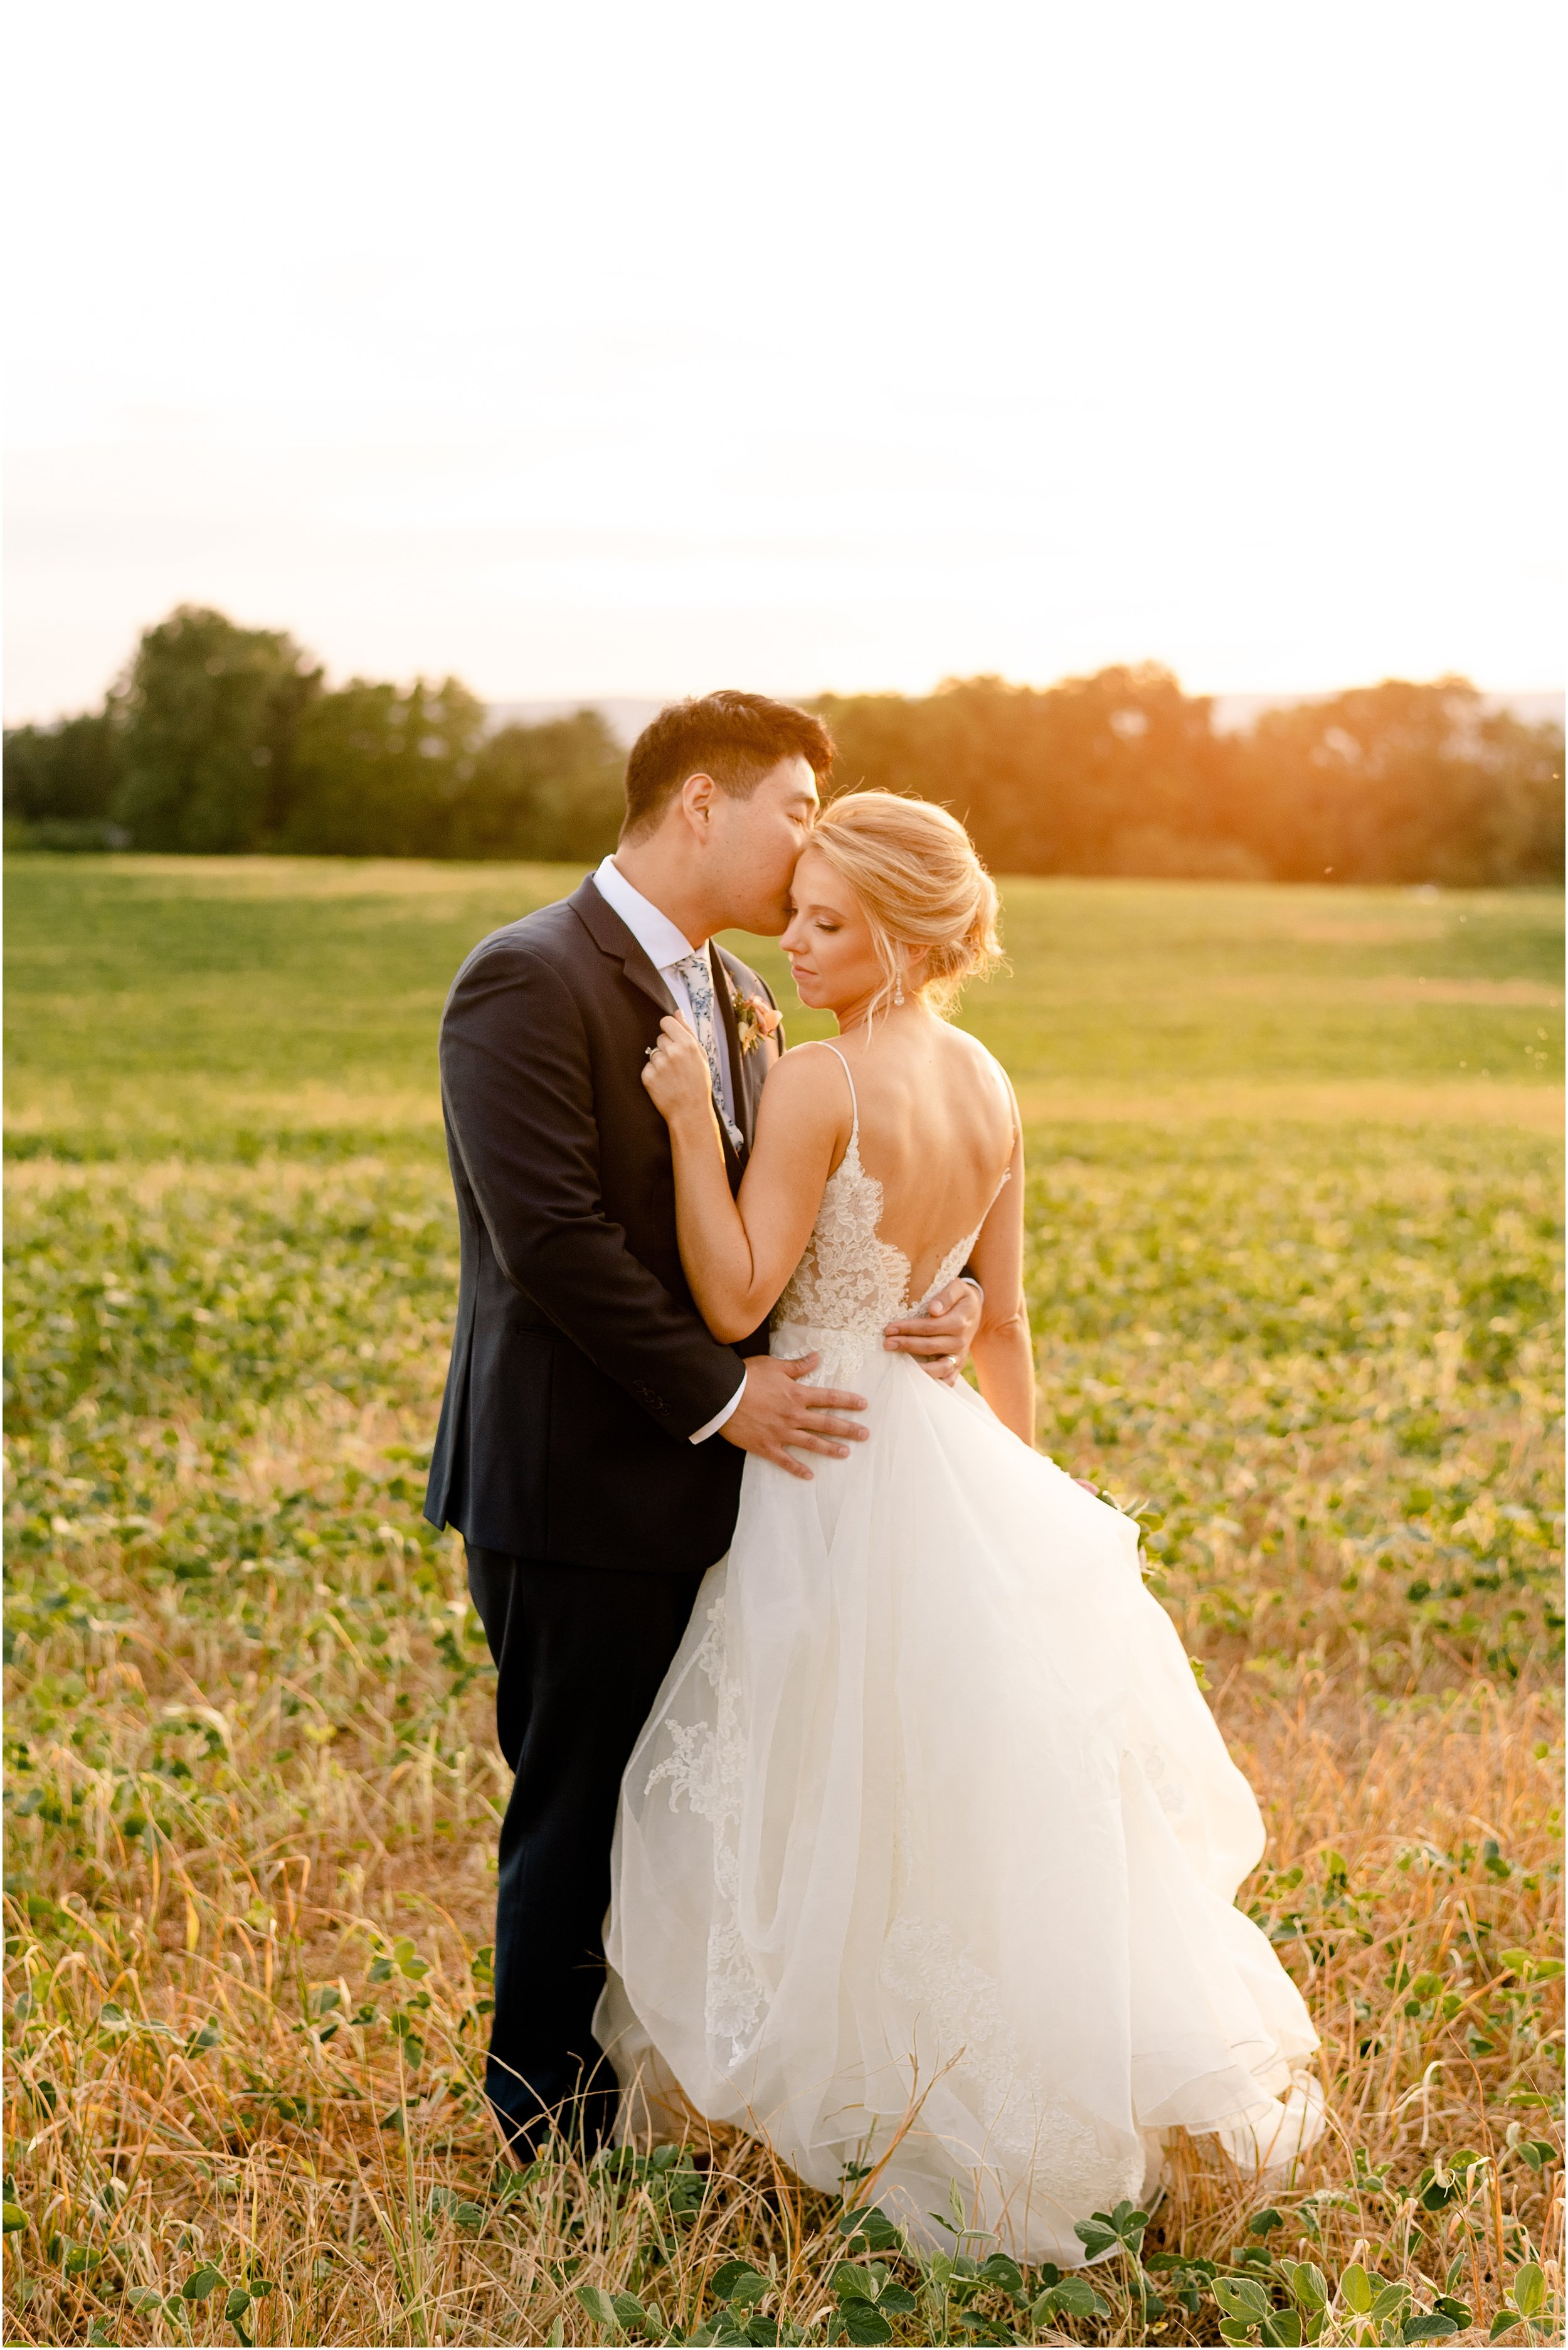 hannah leigh photography Walkers Overlook Wedding Walkersville MD_3552.jpg